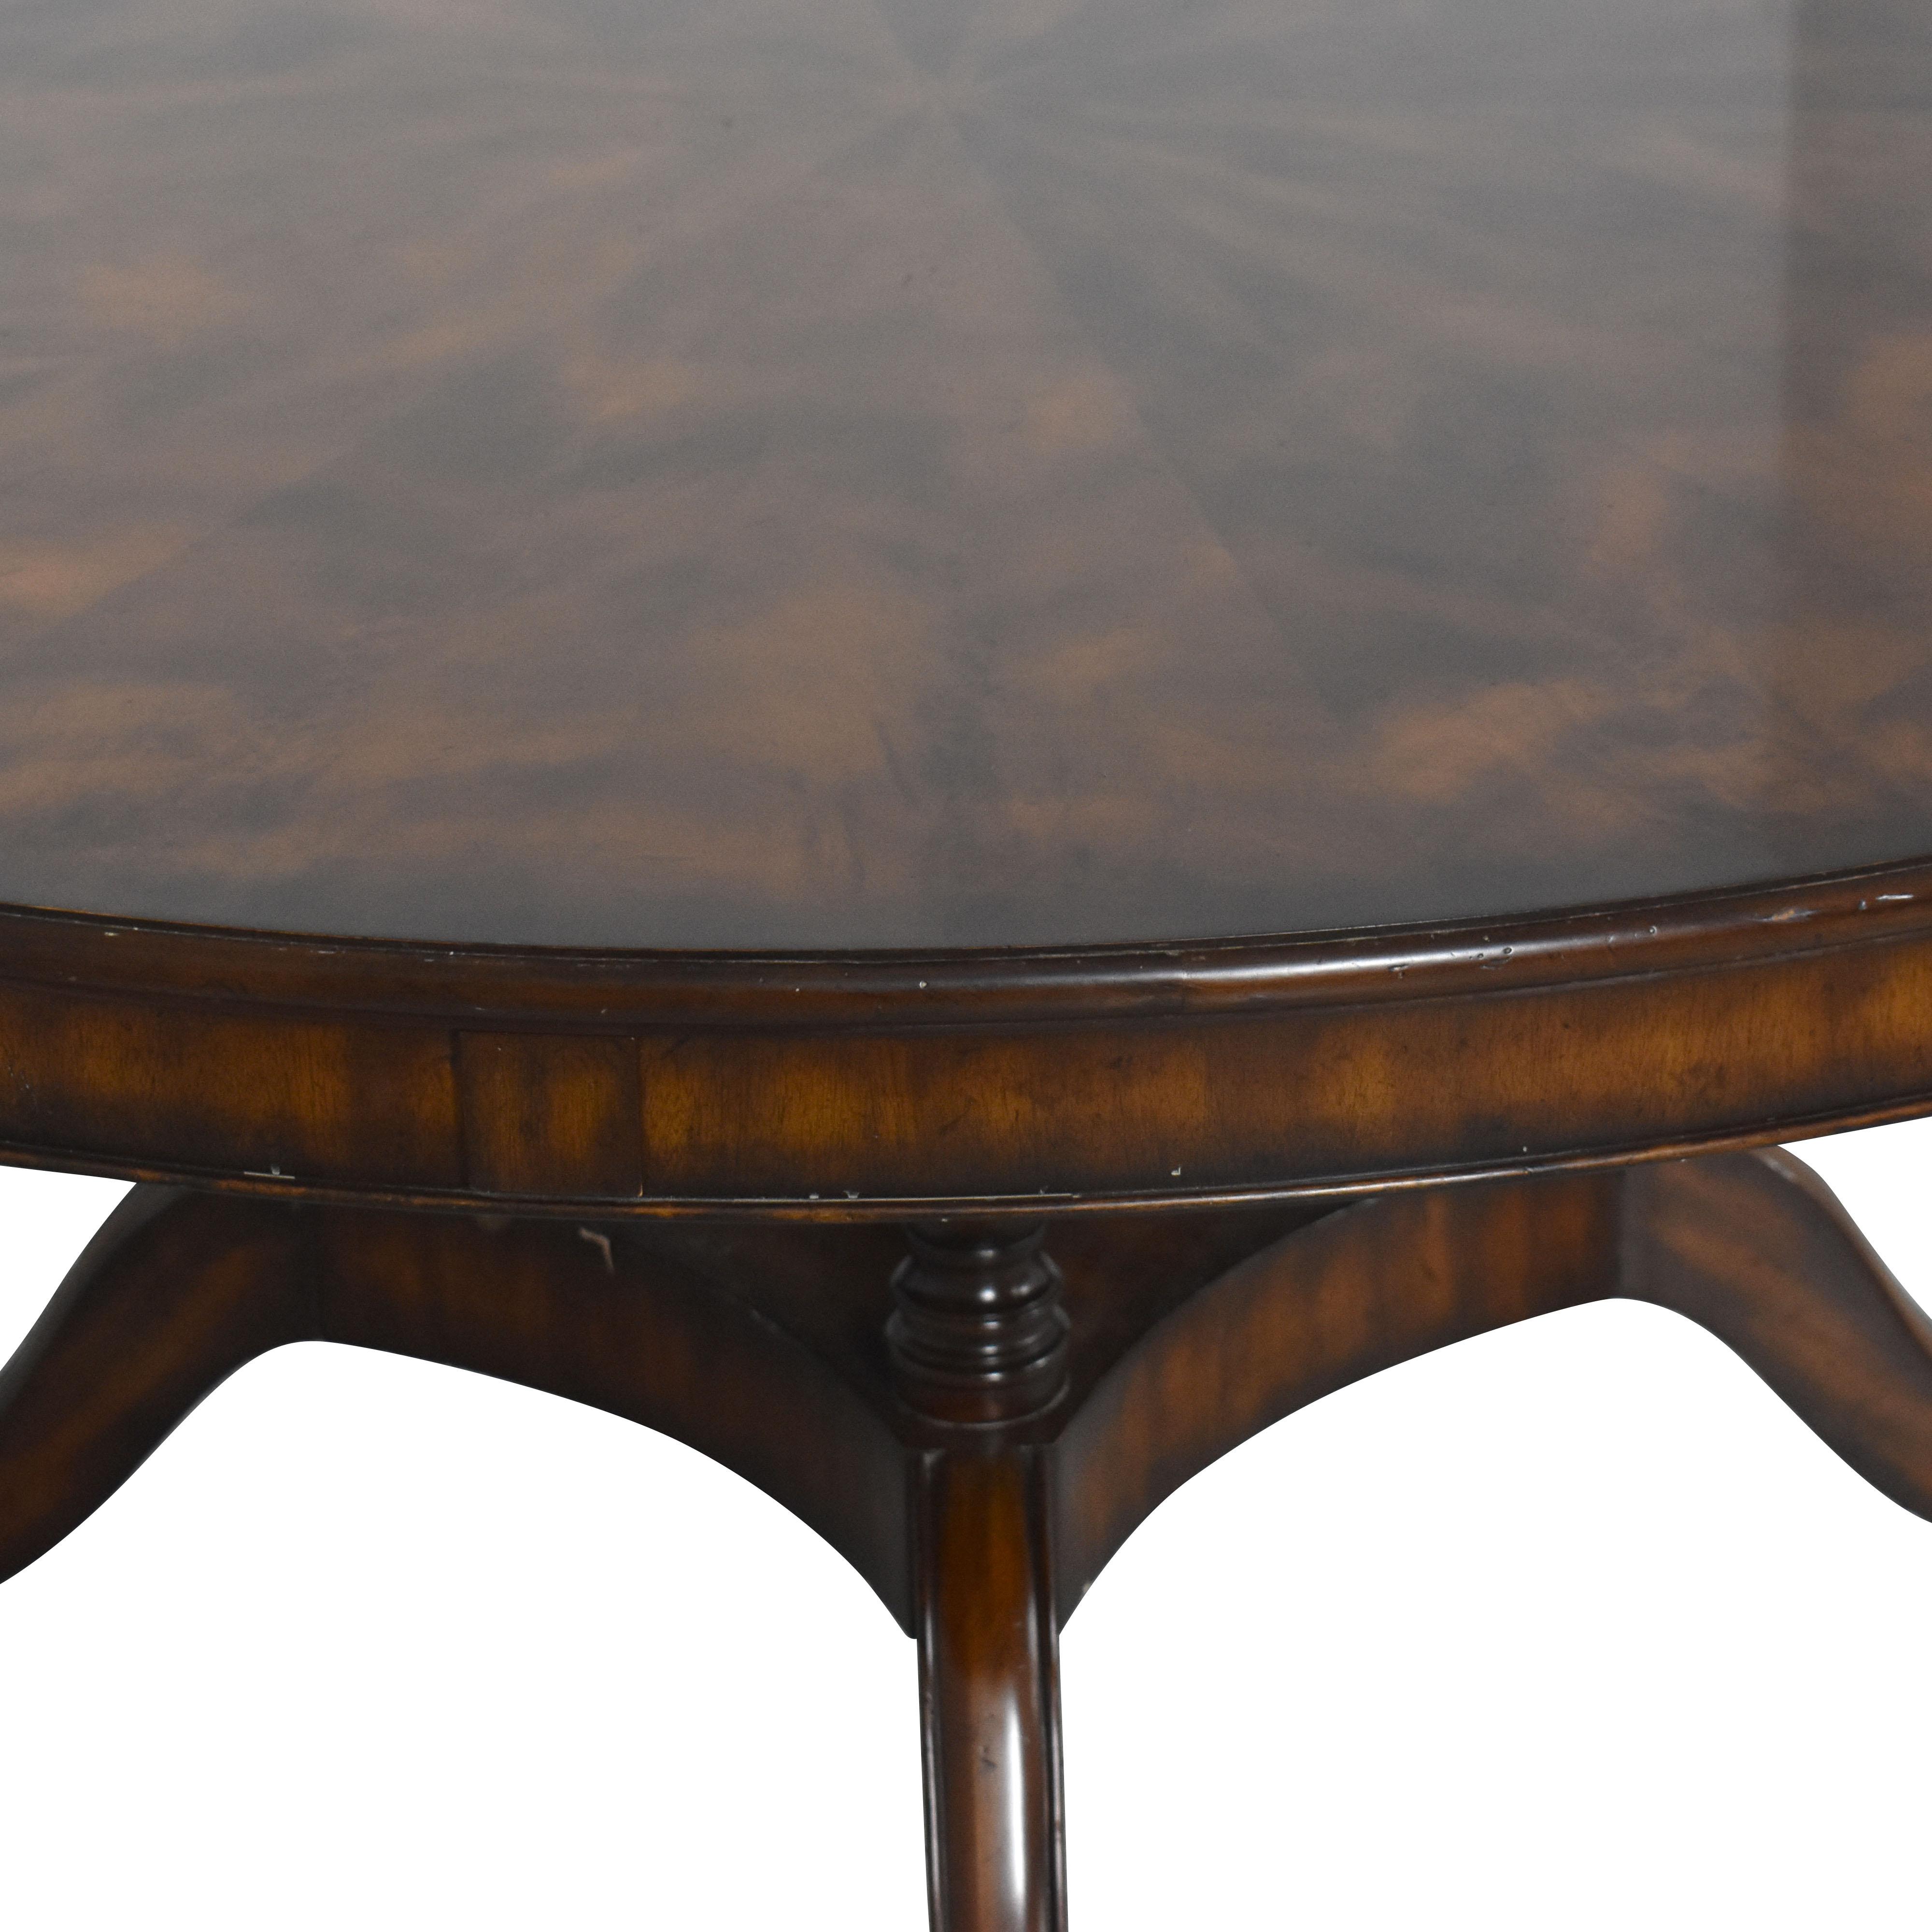 Maitland-Smith Maitland-Smith Dining Table dimensions